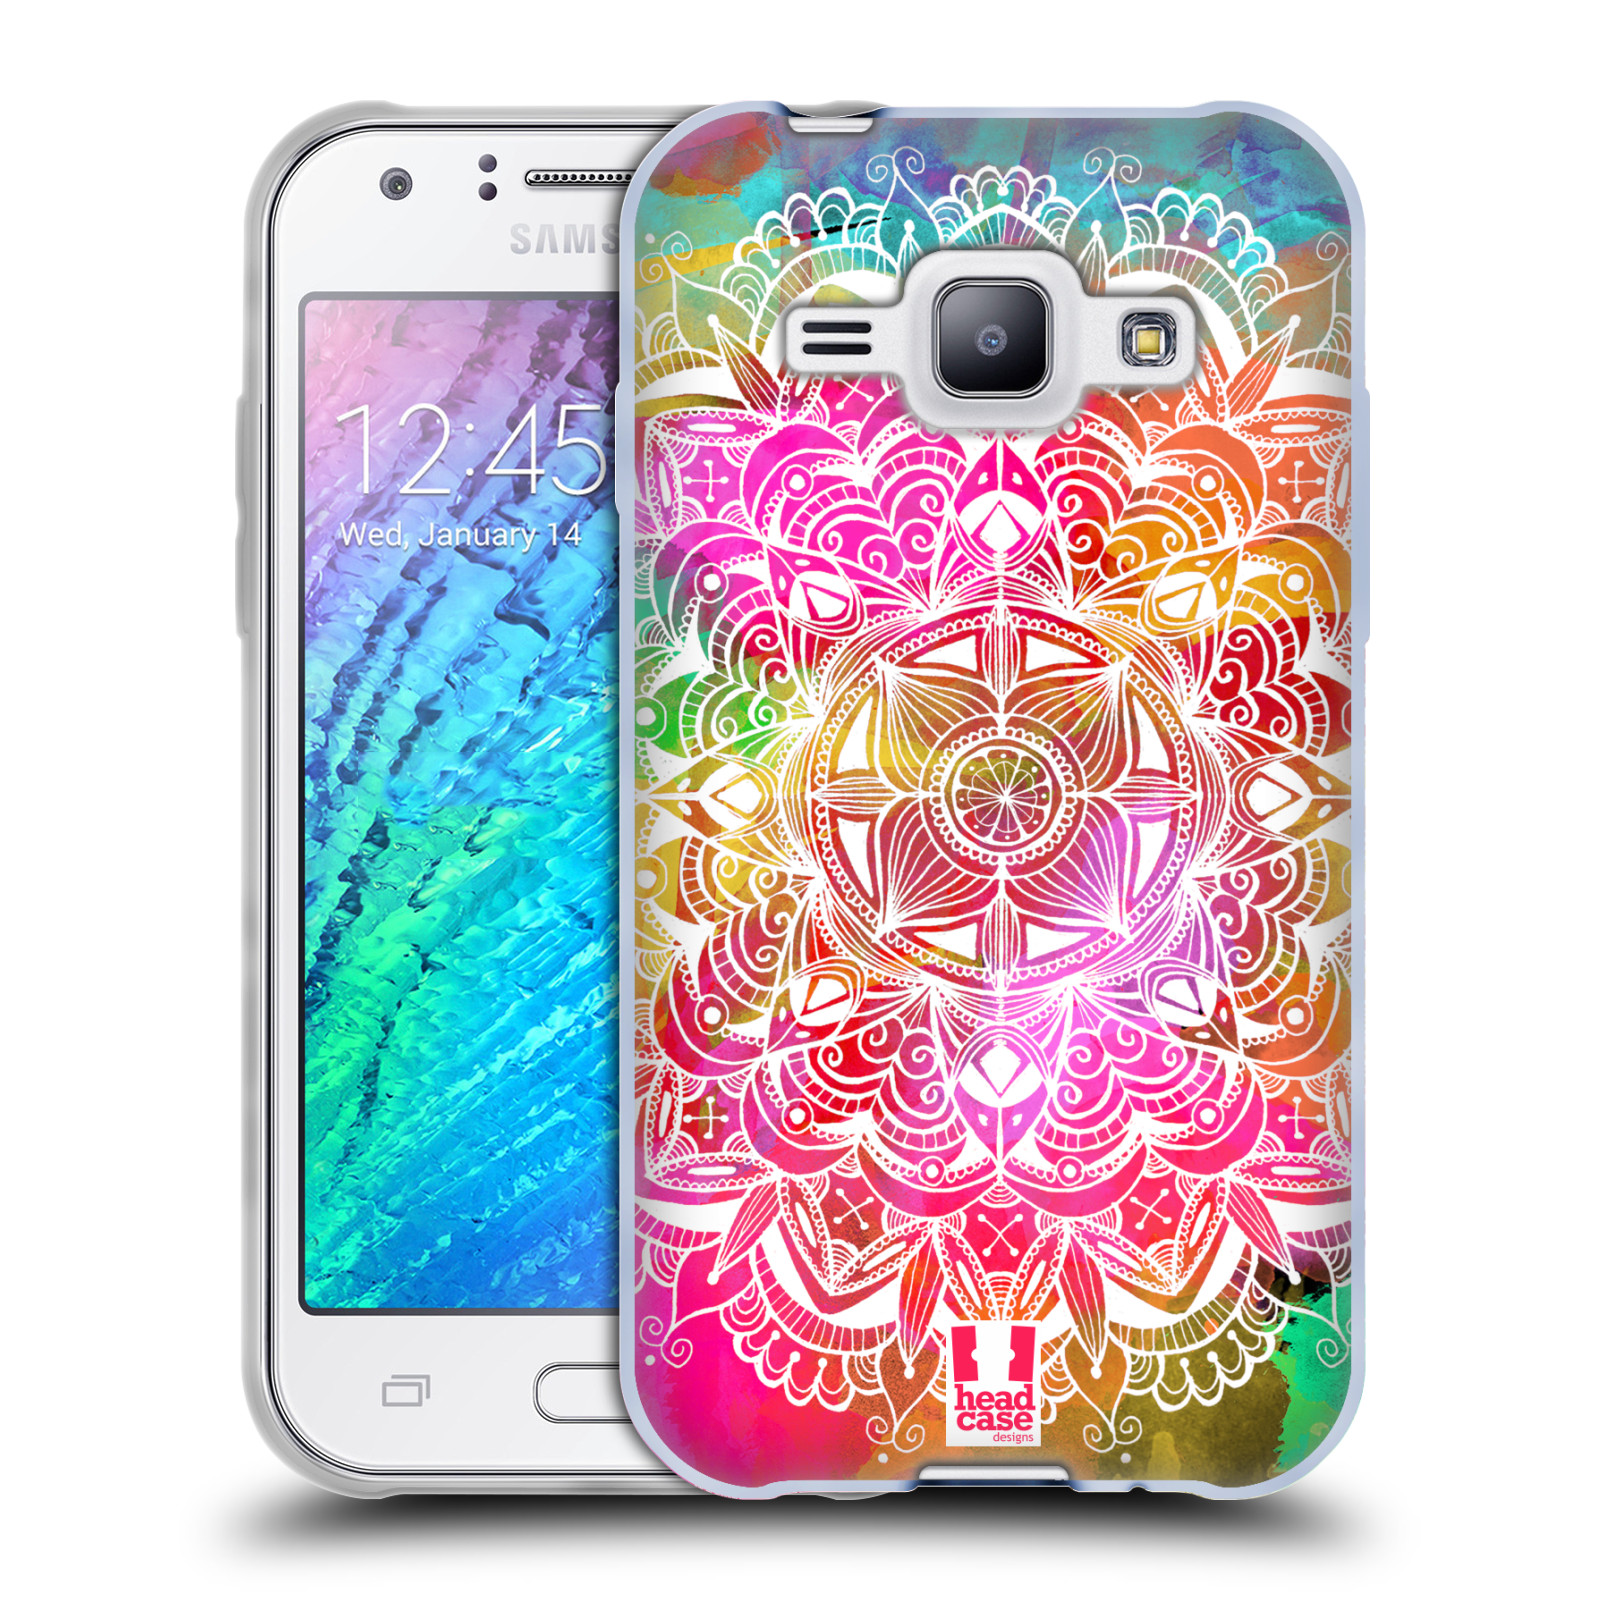 Silikonové pouzdro na mobil Samsung Galaxy J1 HEAD CASE Mandala Doodle Watercolour (Silikonový kryt či obal na mobilní telefon Samsung Galaxy J1 a J1 Duos)